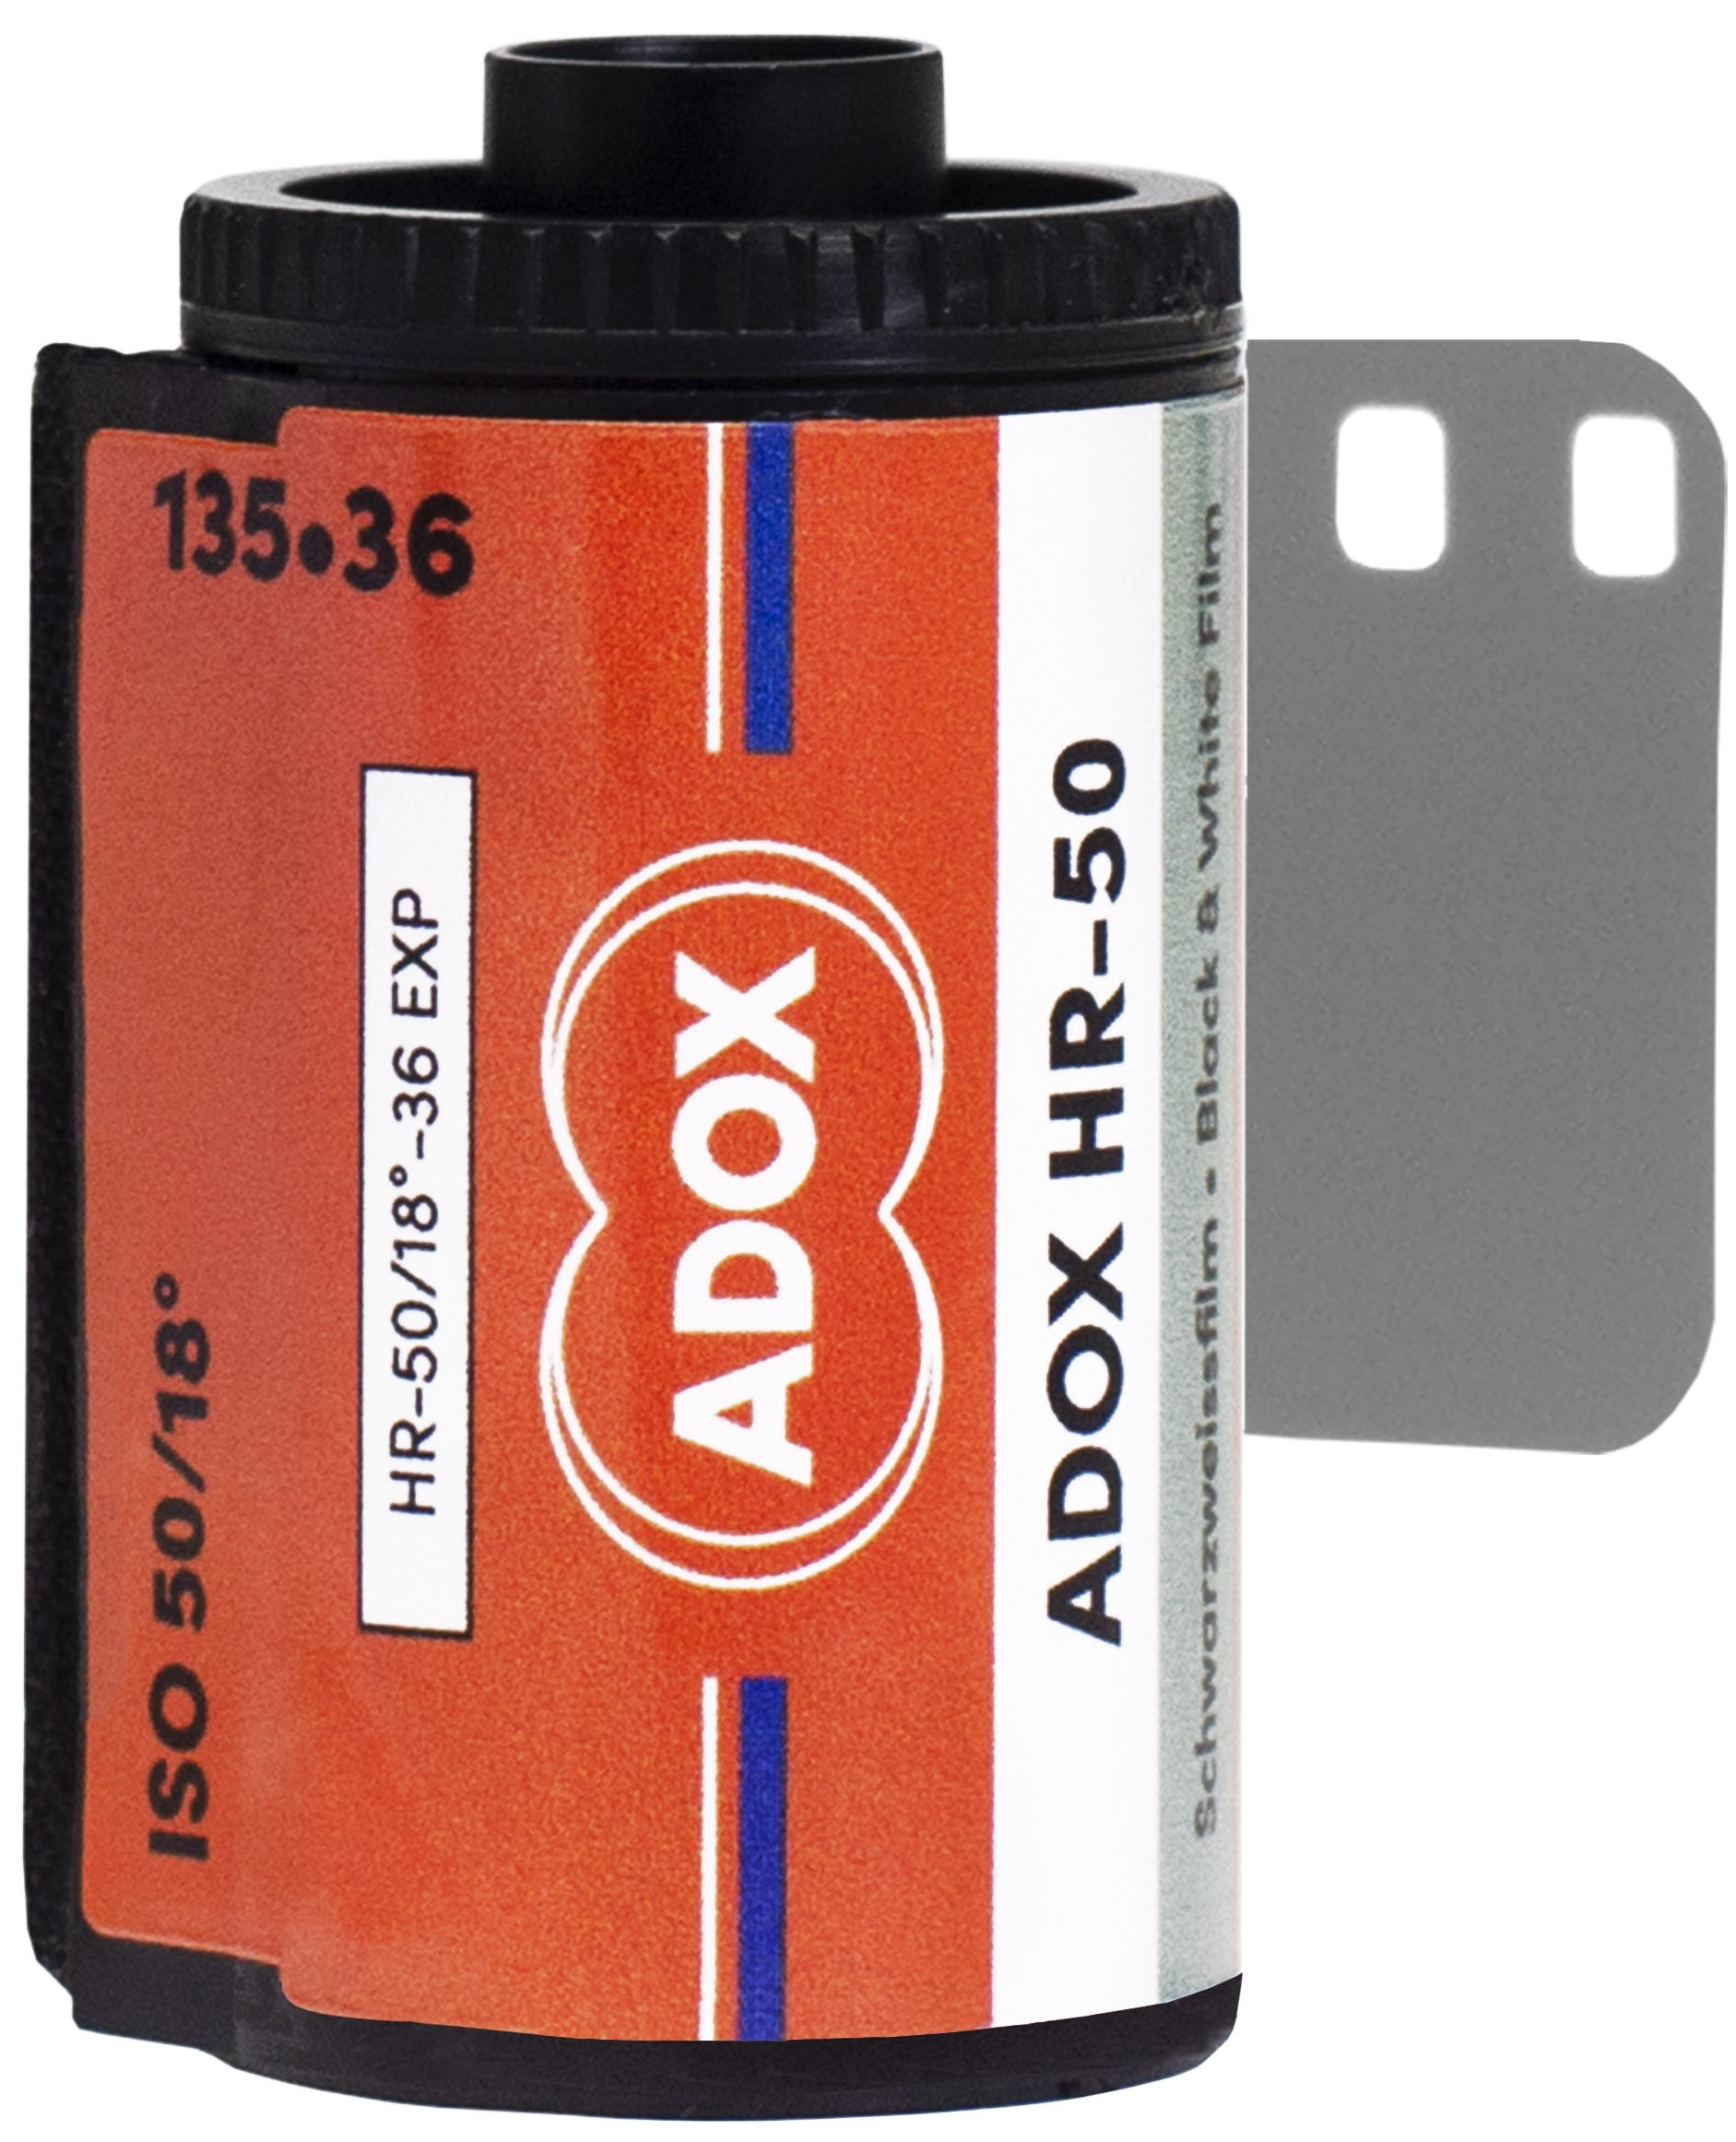 ADOX HR-50/135-36